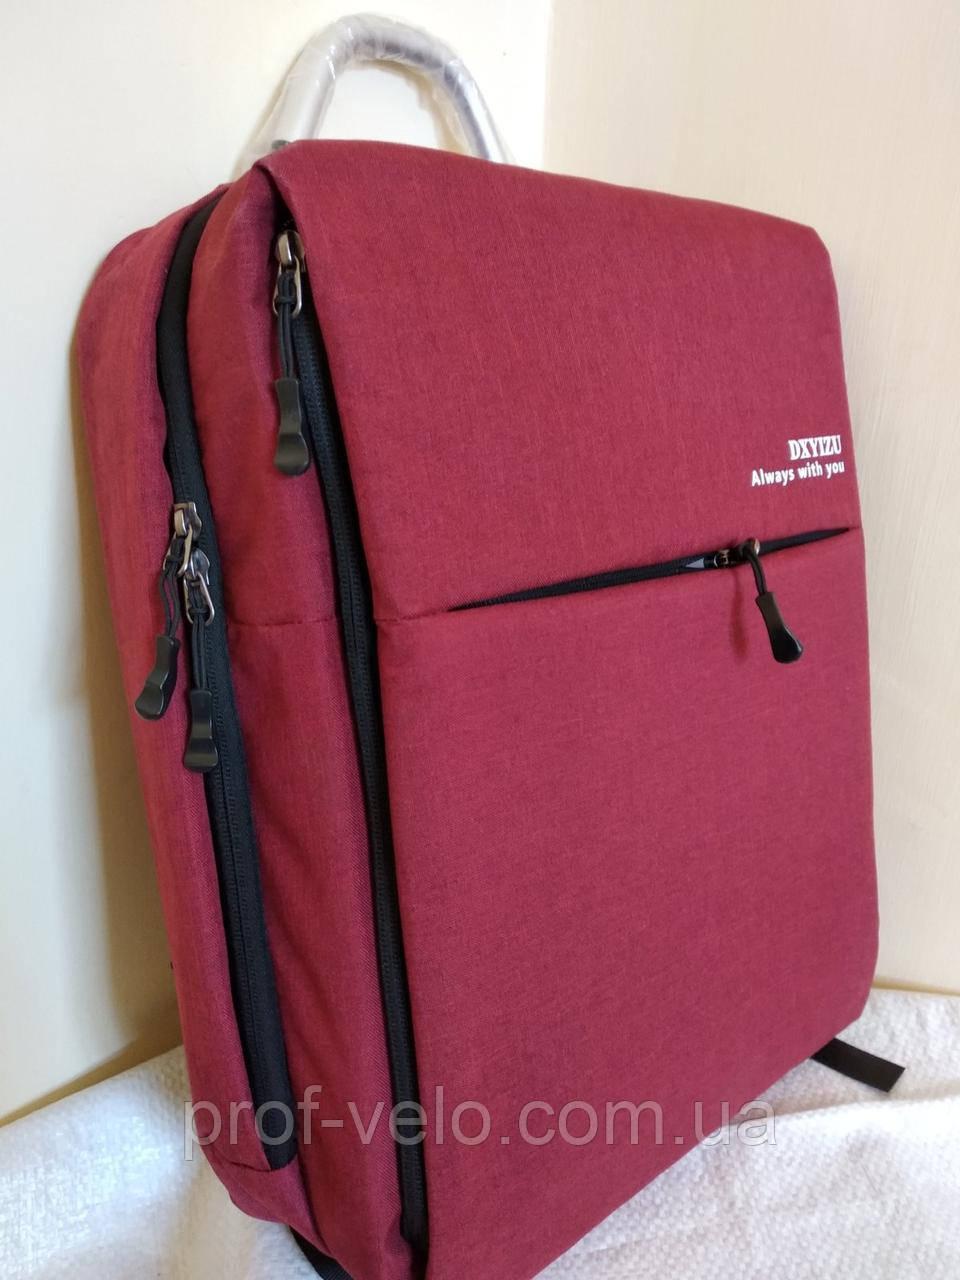 Рюкзак ВИШНЁВОГО цвета с USB.